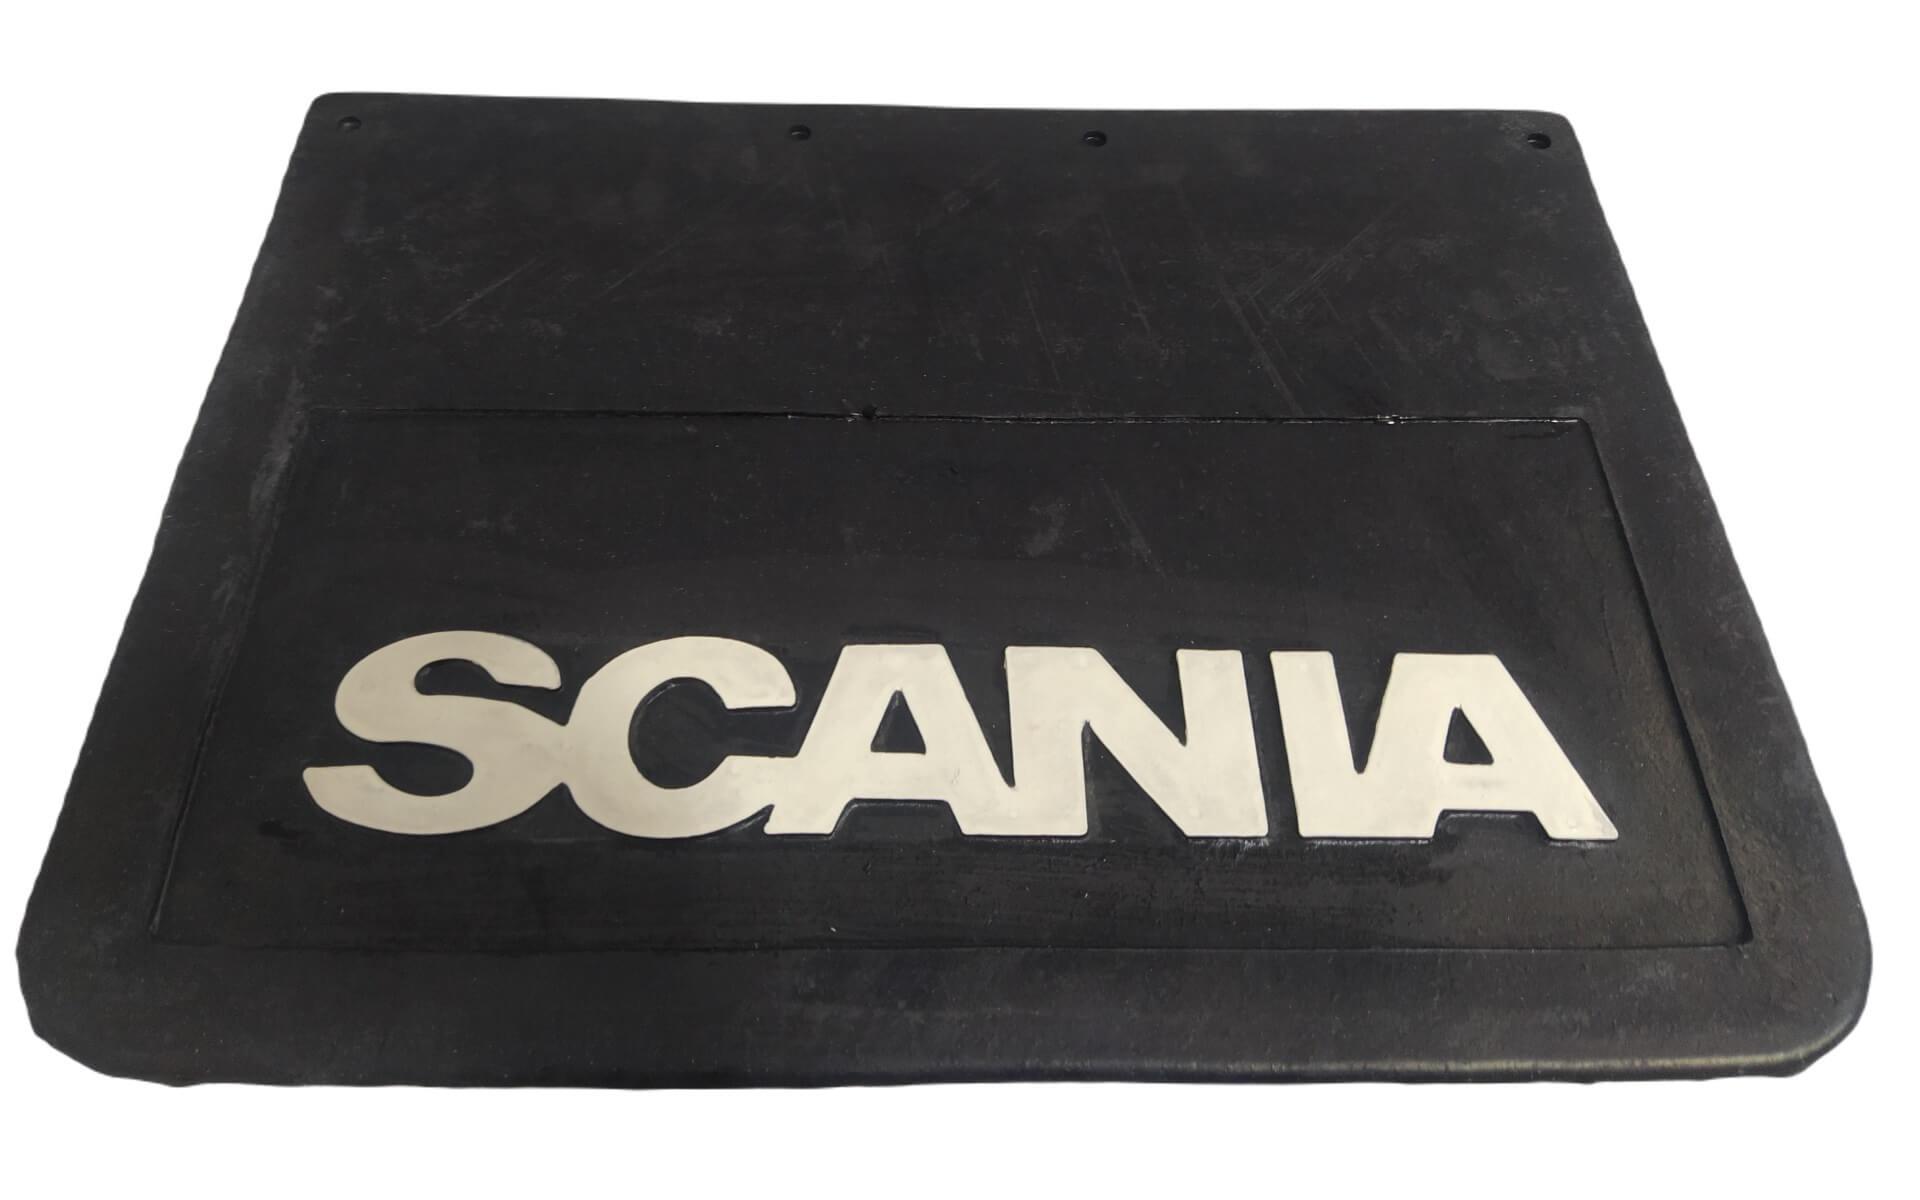 4 Parabarro Dianteiro Scania 112 113 Lameiro 50 X 36 Cm